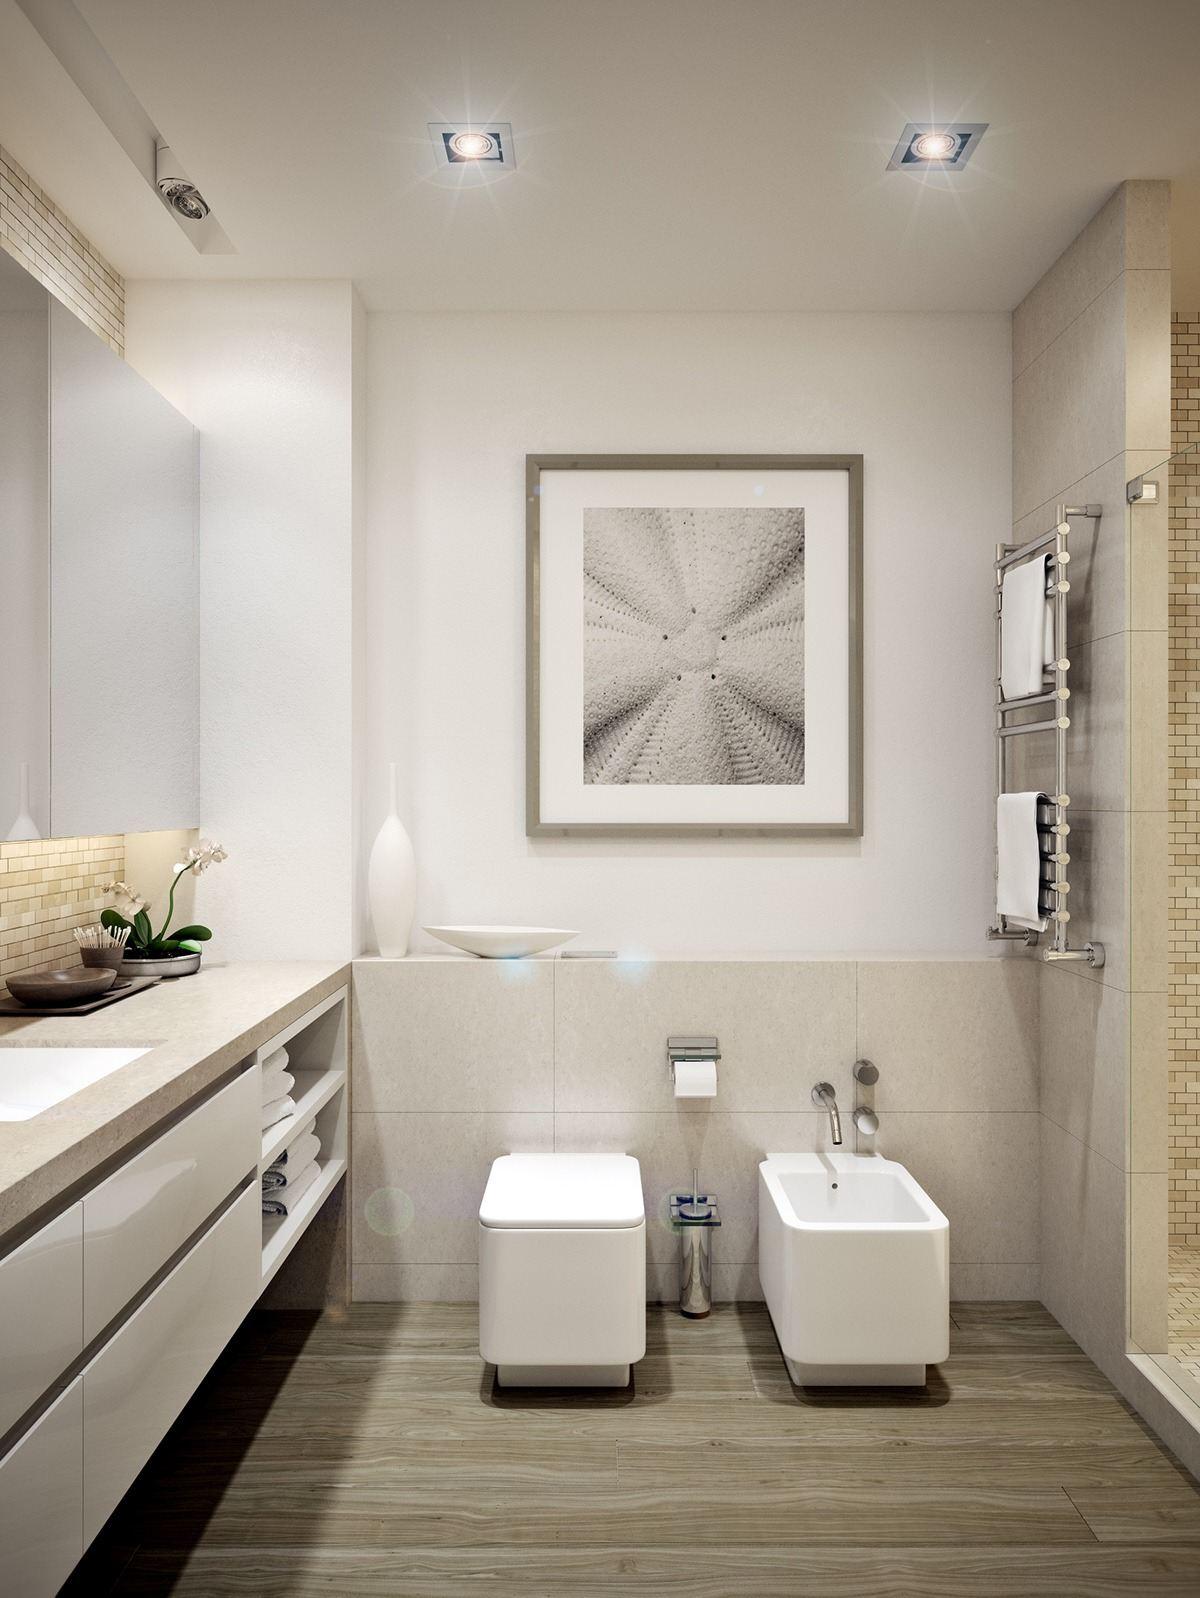 subtle-ocean-bathroom-theme Small Bathrooms Minimalistic Design on chic bathrooms, weird bathrooms, beautiful bathrooms, rock bathrooms, christmas bathrooms, feminine bathrooms, house bathrooms, modern bathrooms, funky bathrooms, timeless bathrooms, themed bathrooms, stylish bathrooms, home bathrooms, dark bathrooms, sports bathrooms,